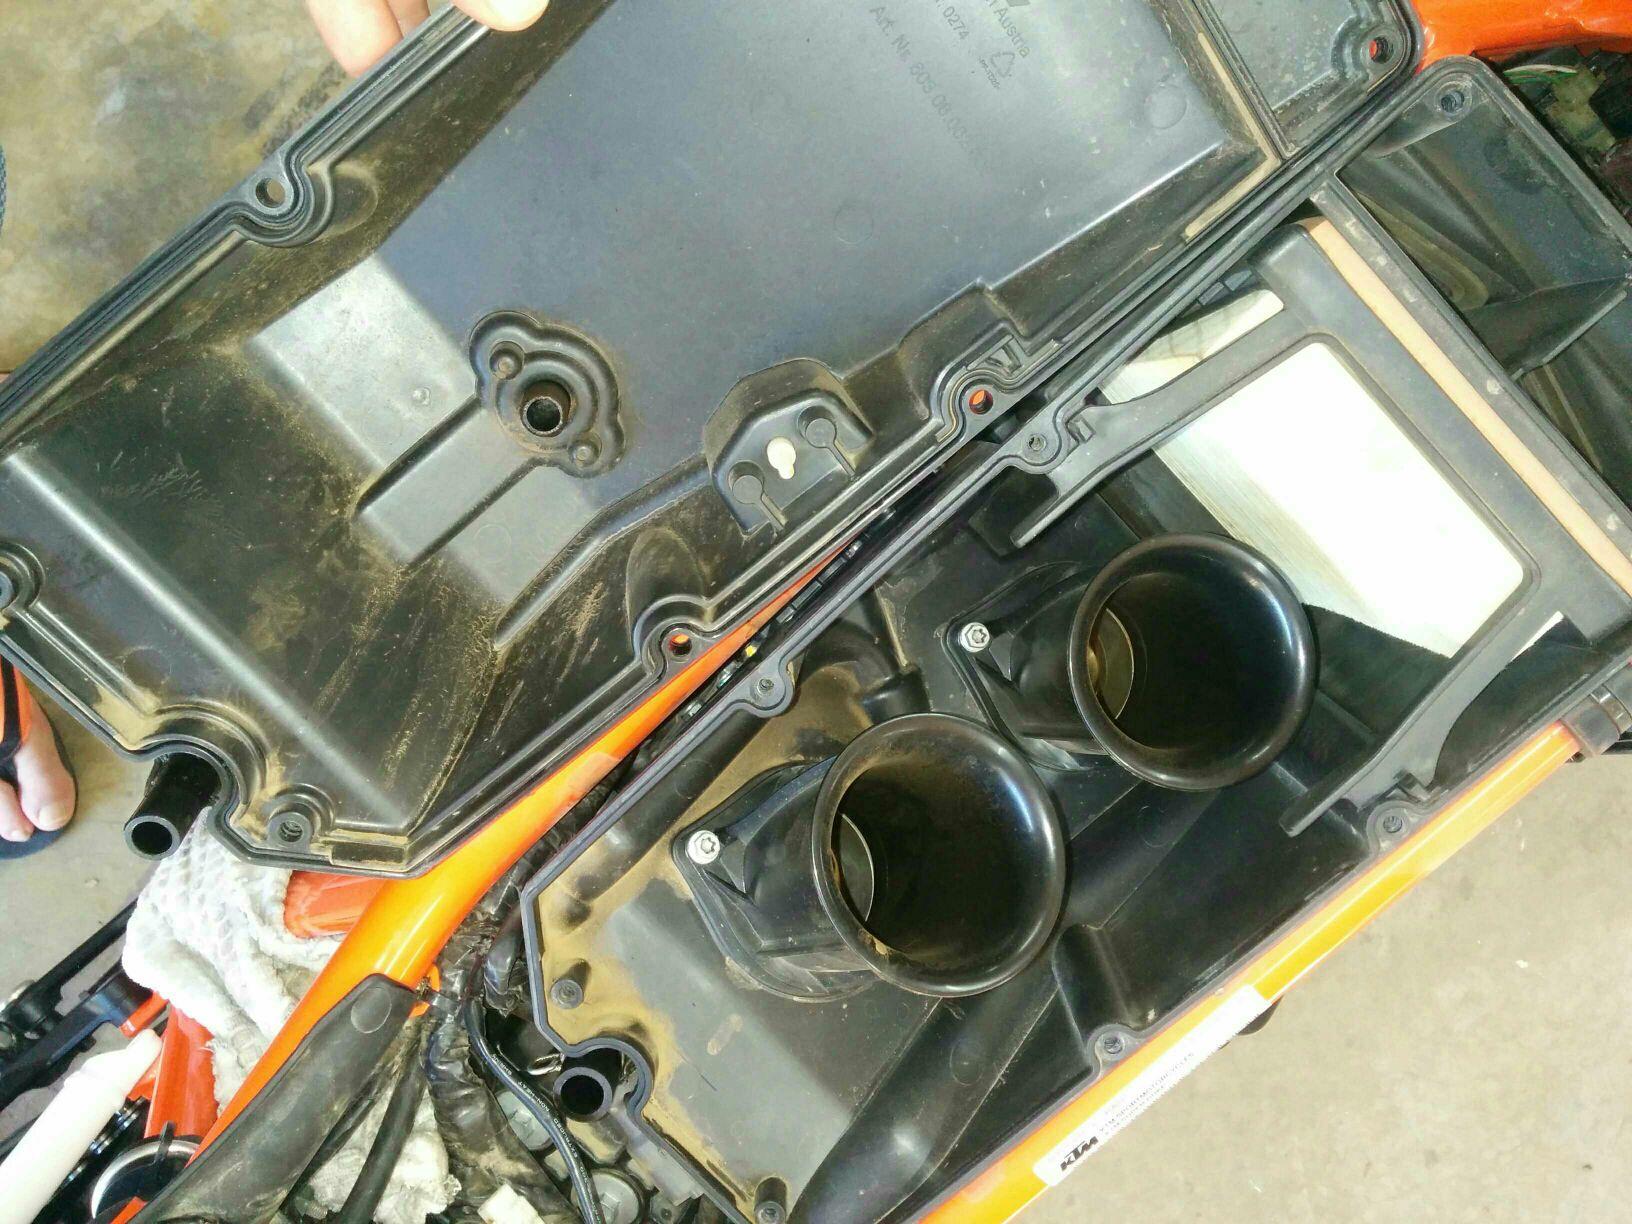 Cold start problem - totaly stock bike 2014 R - KTM Super Twins Forum